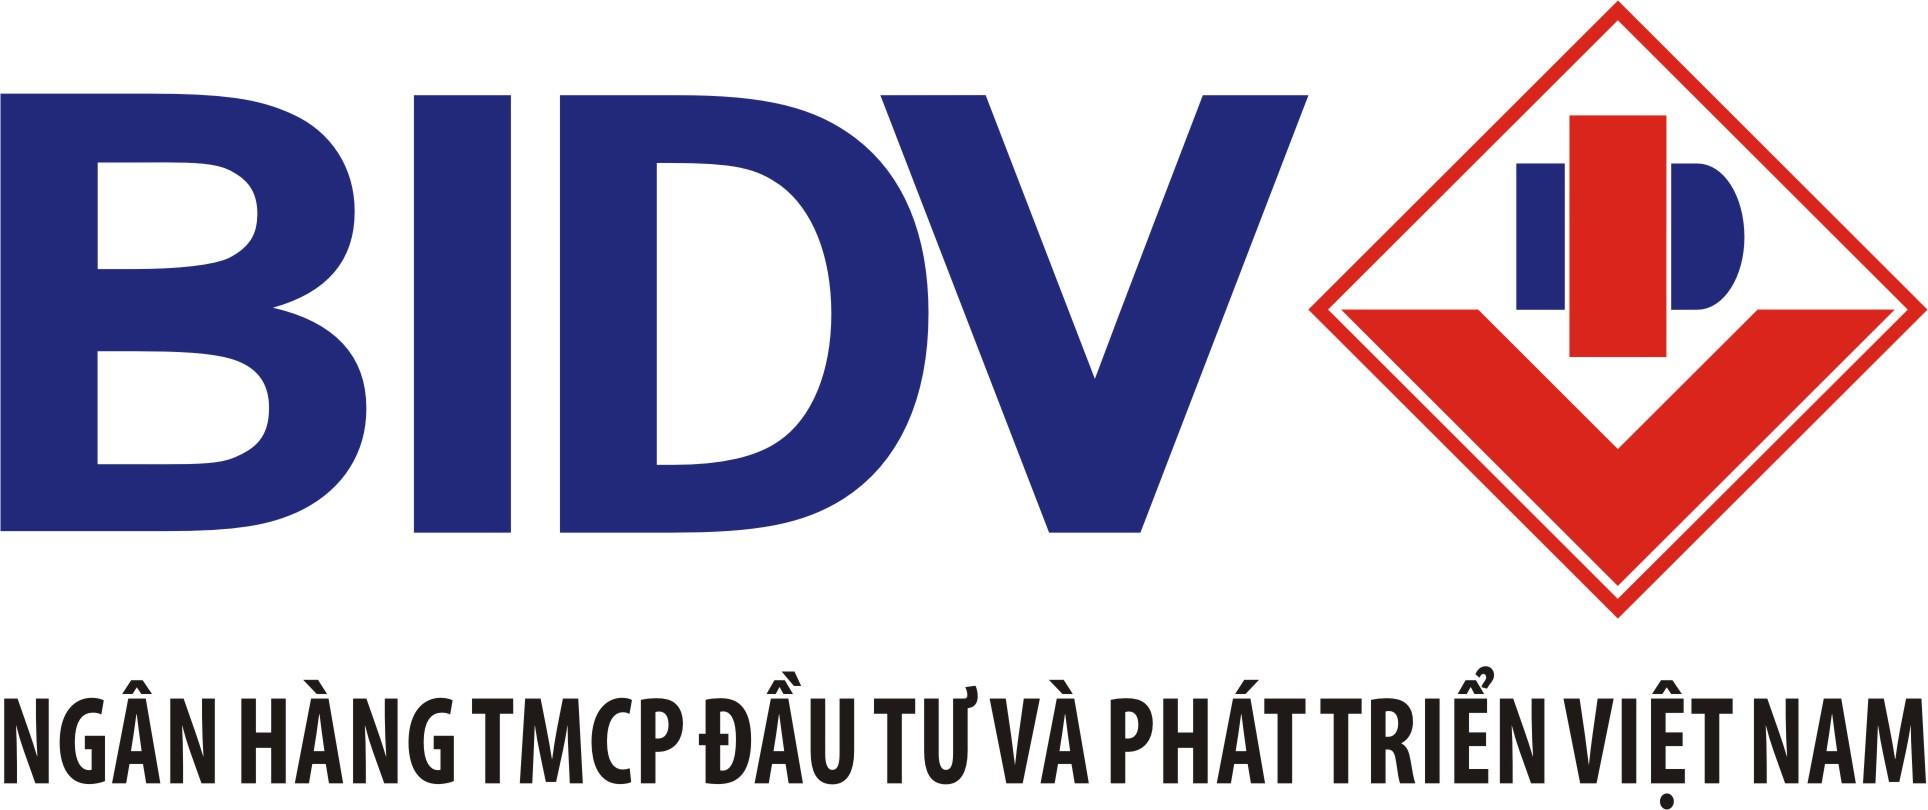 bidv-logo1-10-09-2017-14-38-47.jpg